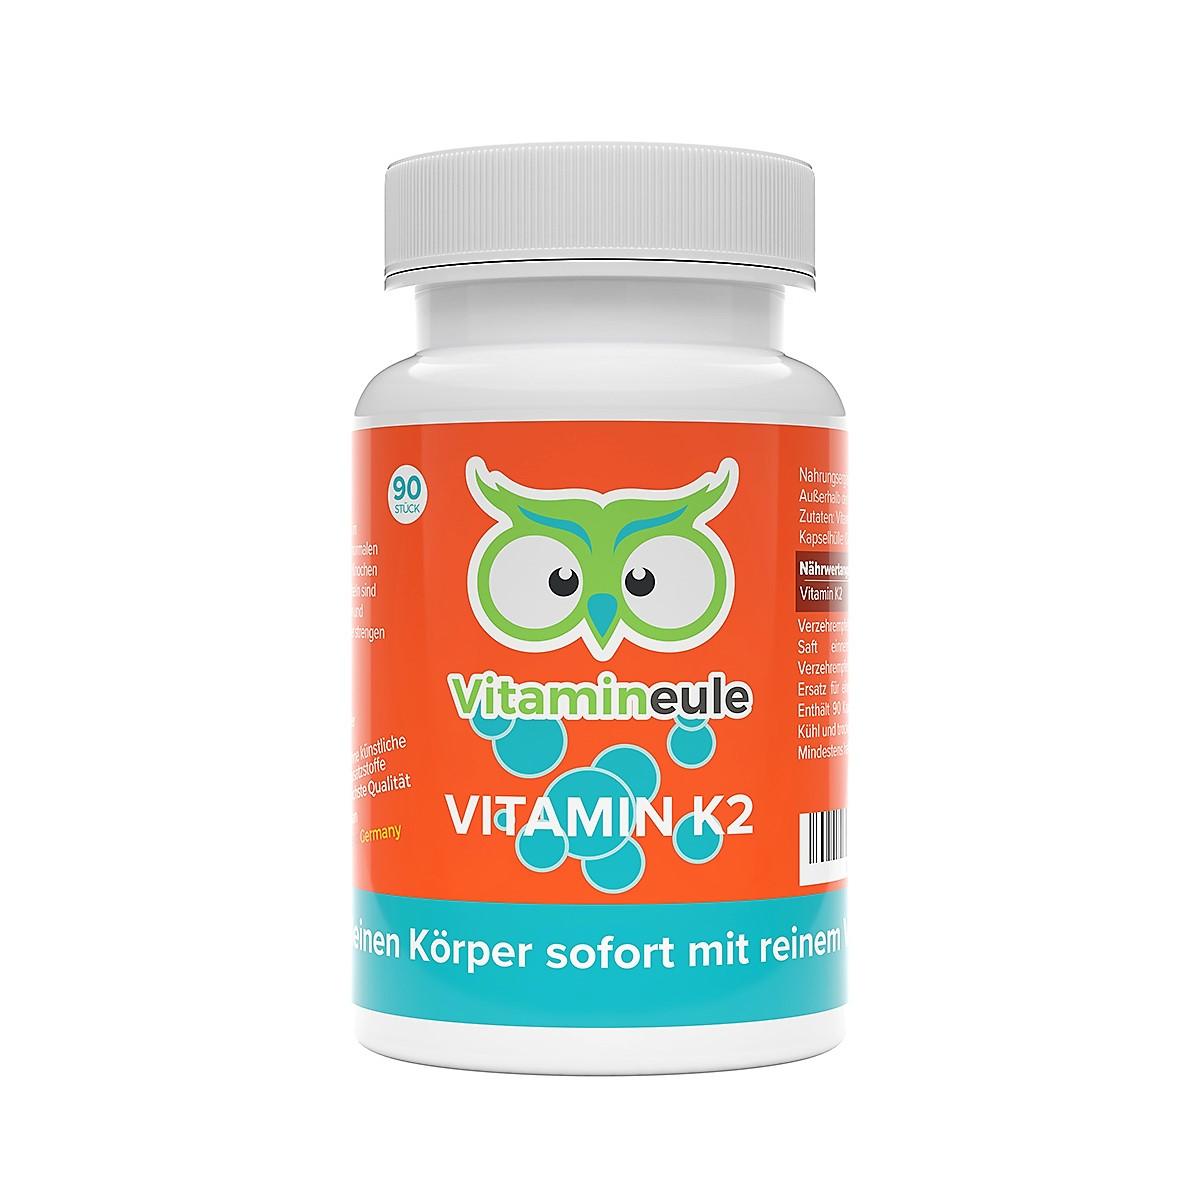 Vitamin K2 Kapseln von Vitamineule